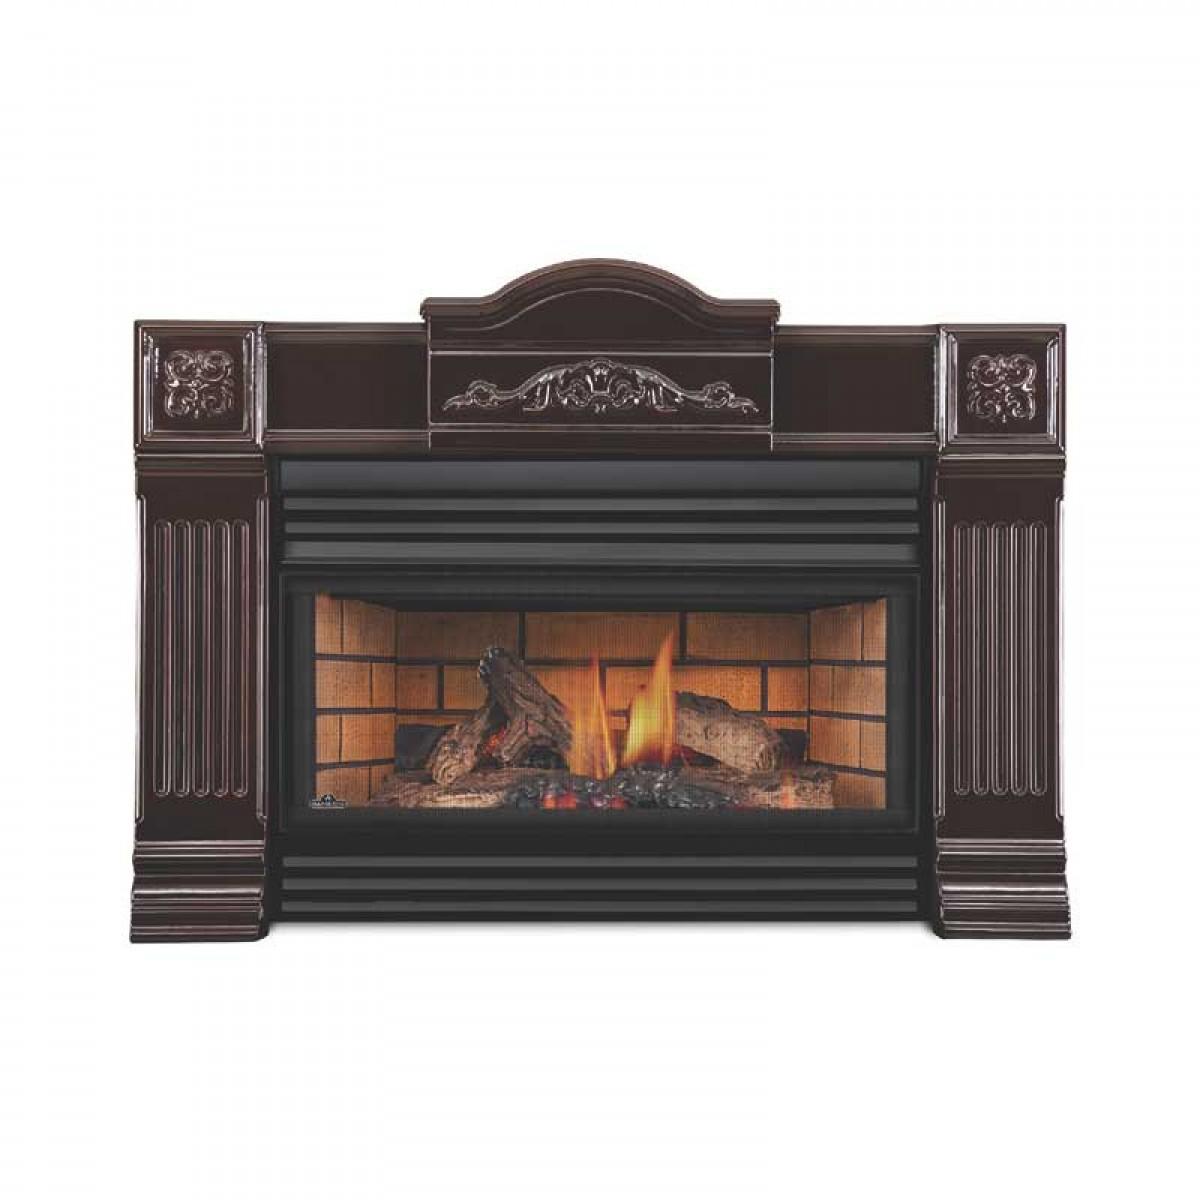 Napoleon Roxbury 3600 Gas Fireplace Insert